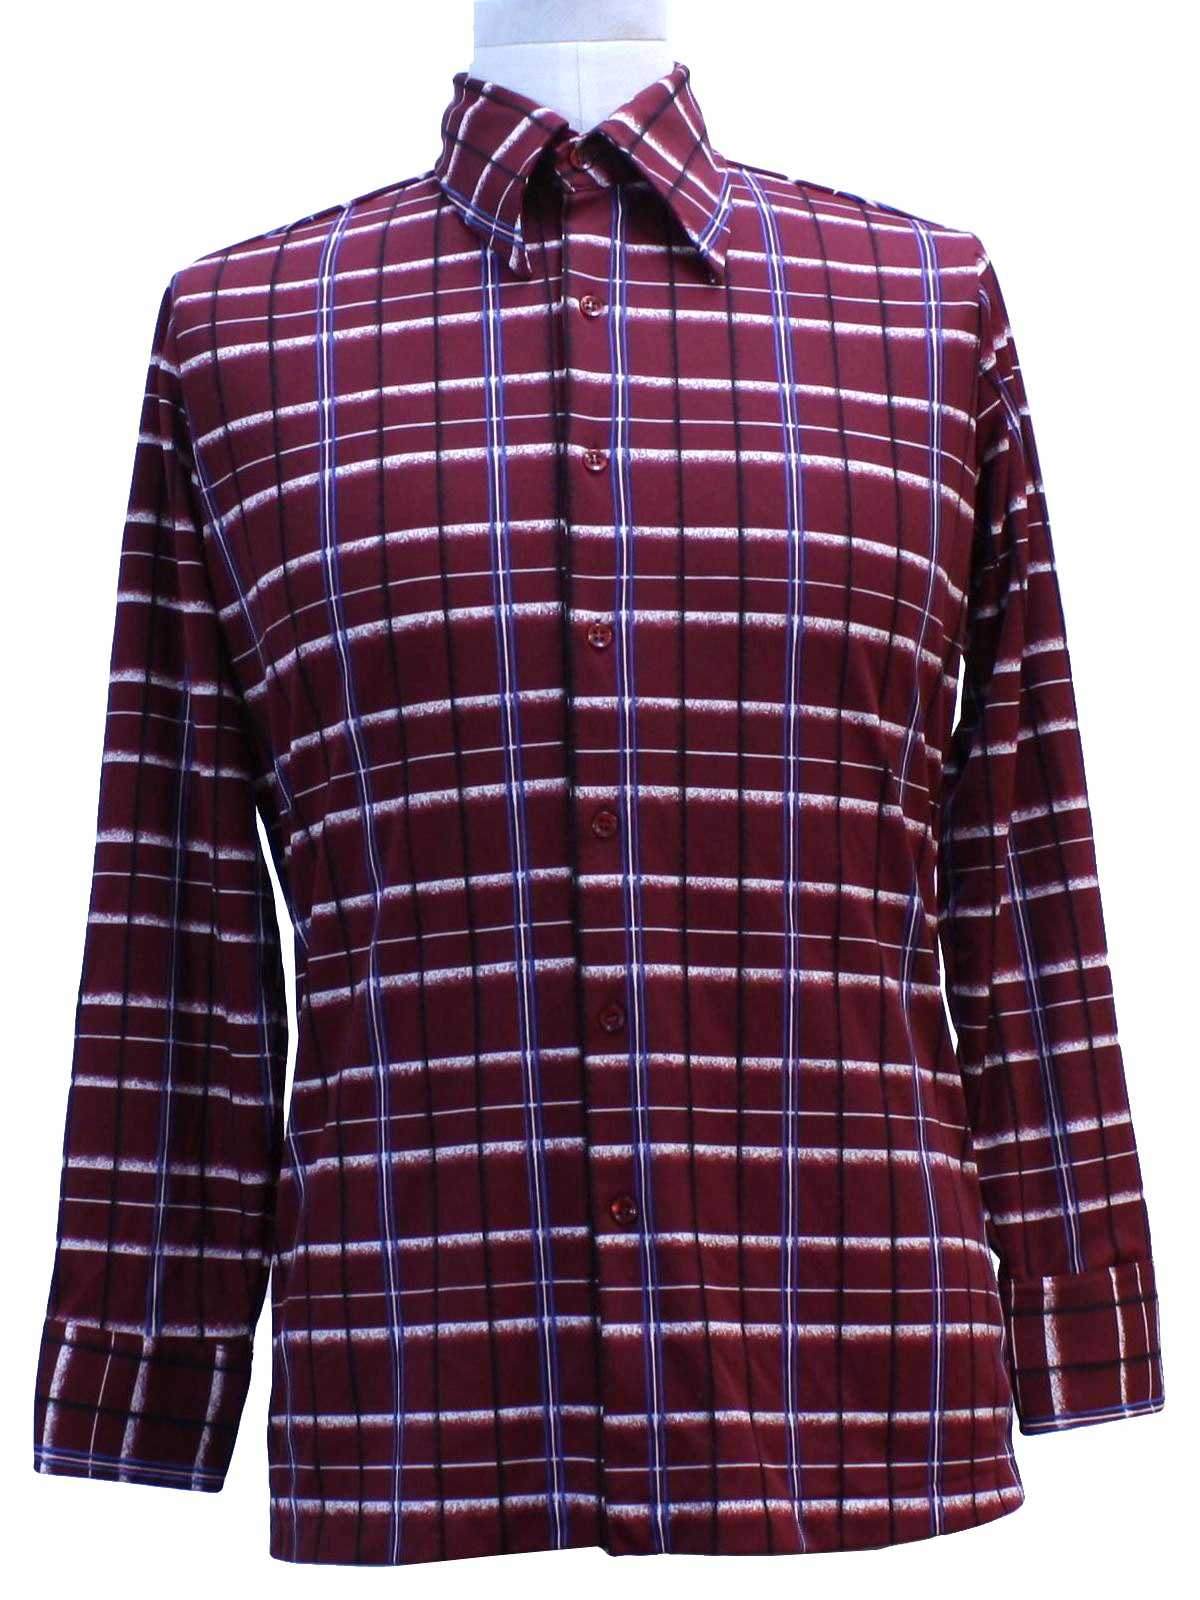 Retro 70s print disco shirt kmart 70s kmart mens for Kmart button up shirts